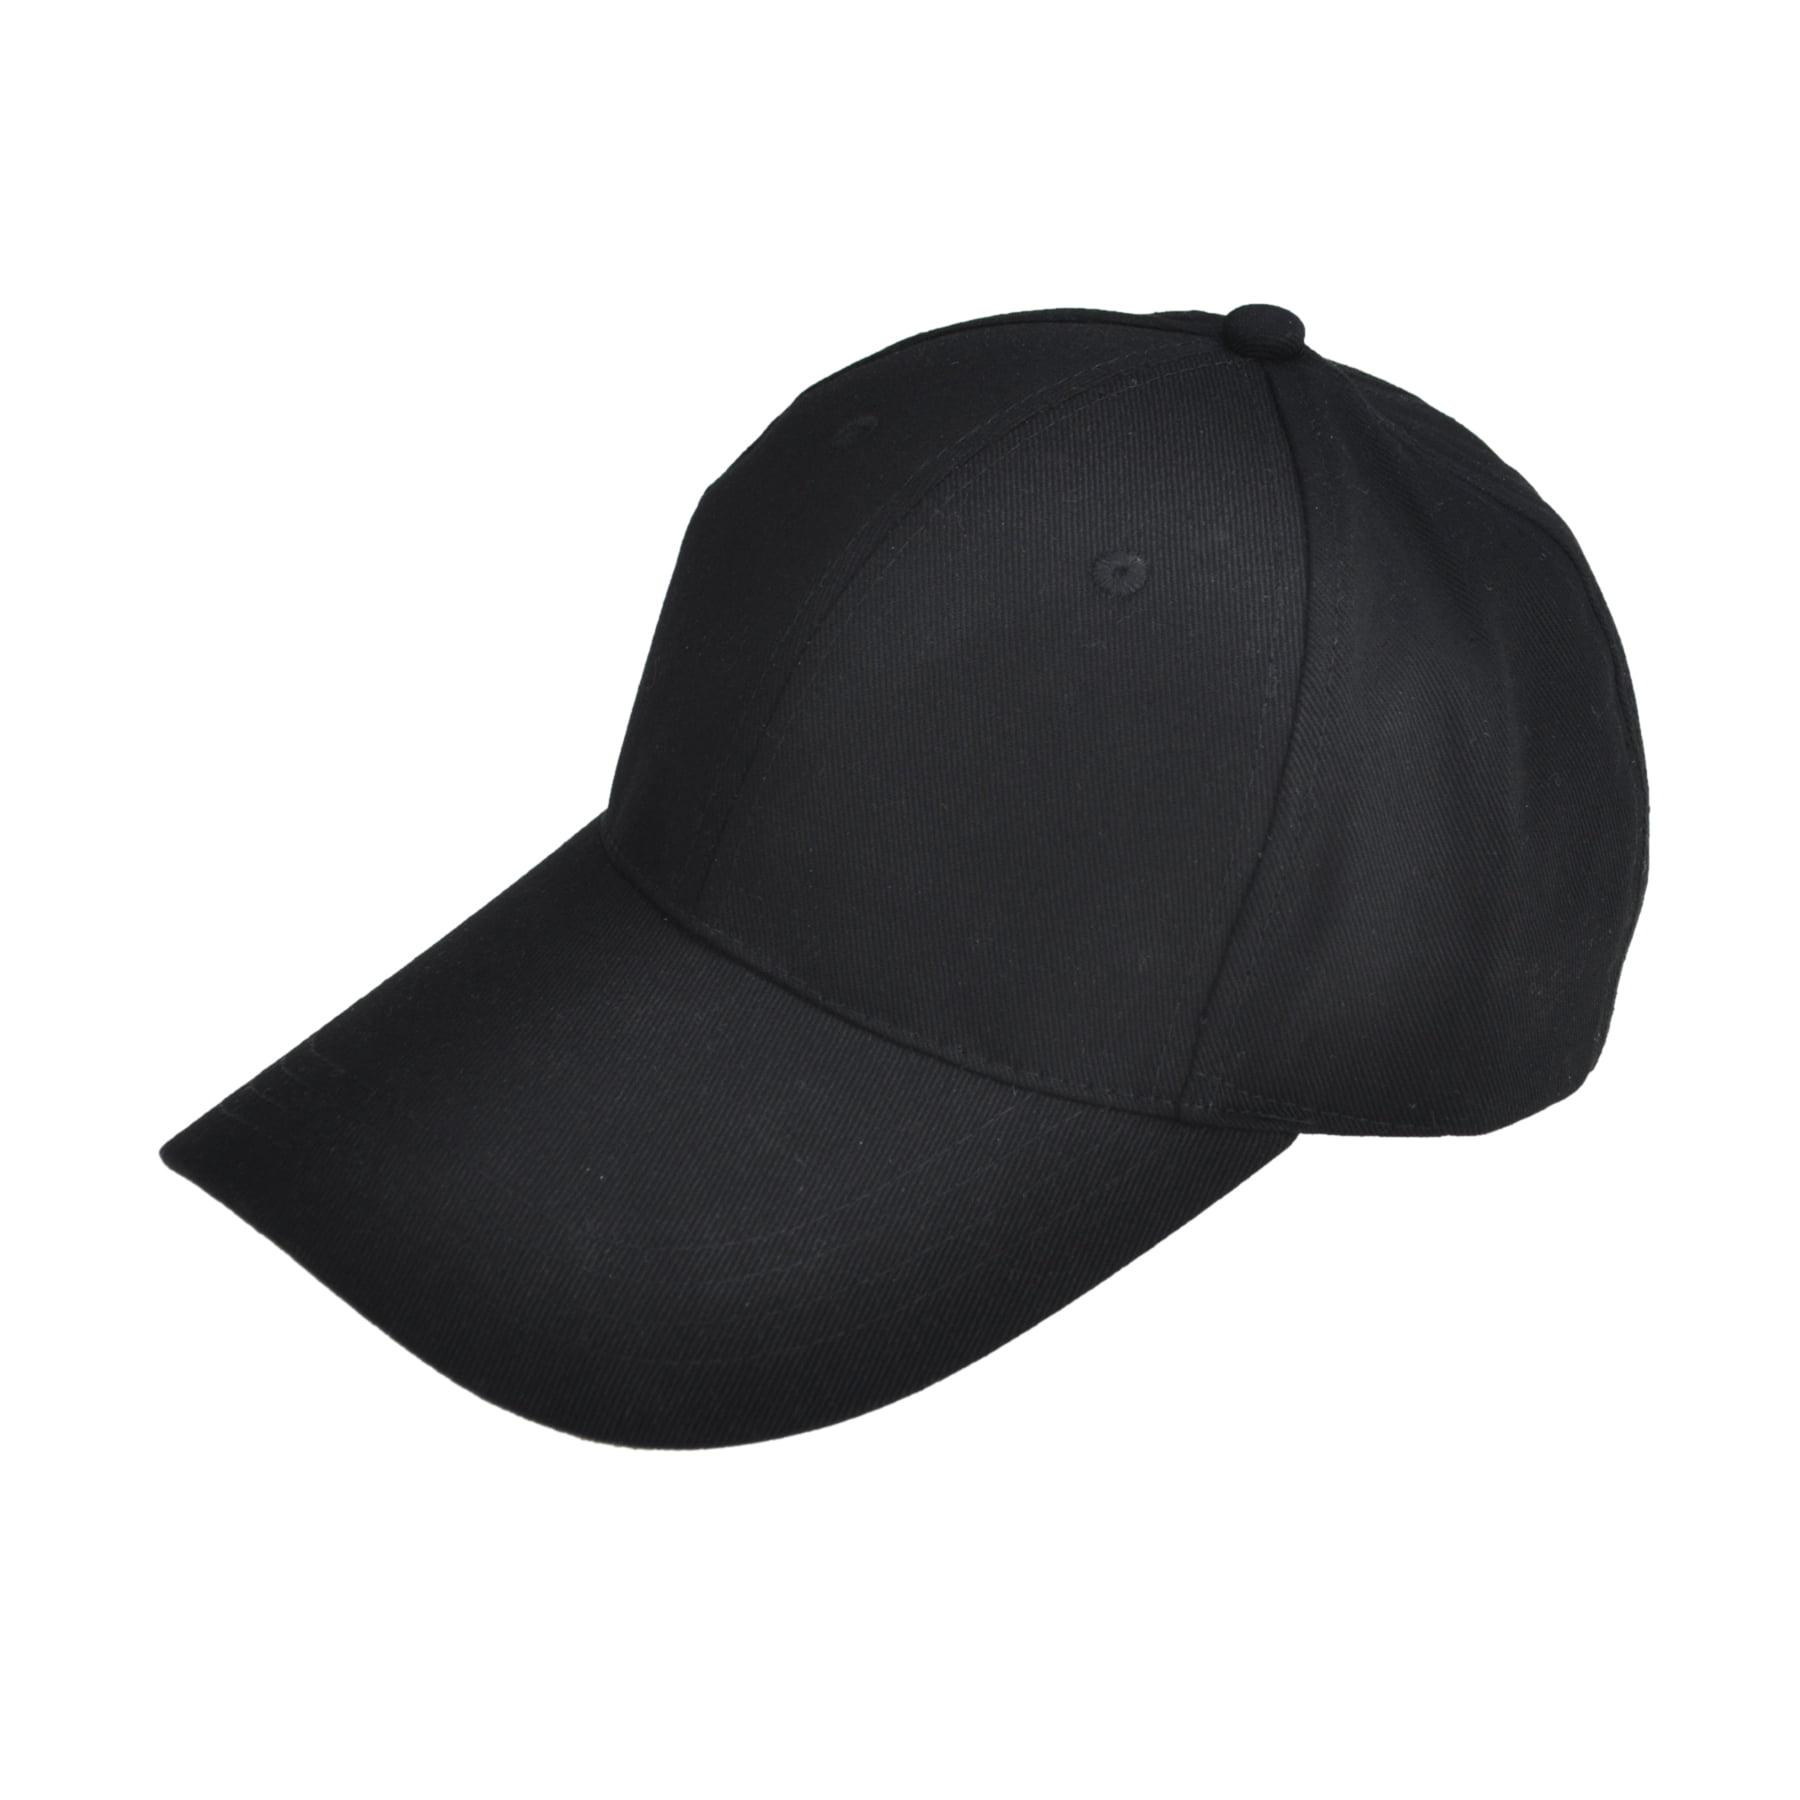 SRTTop Level Baseball Caps Men Women Classic Adjustable Plain Hats Dad Hats